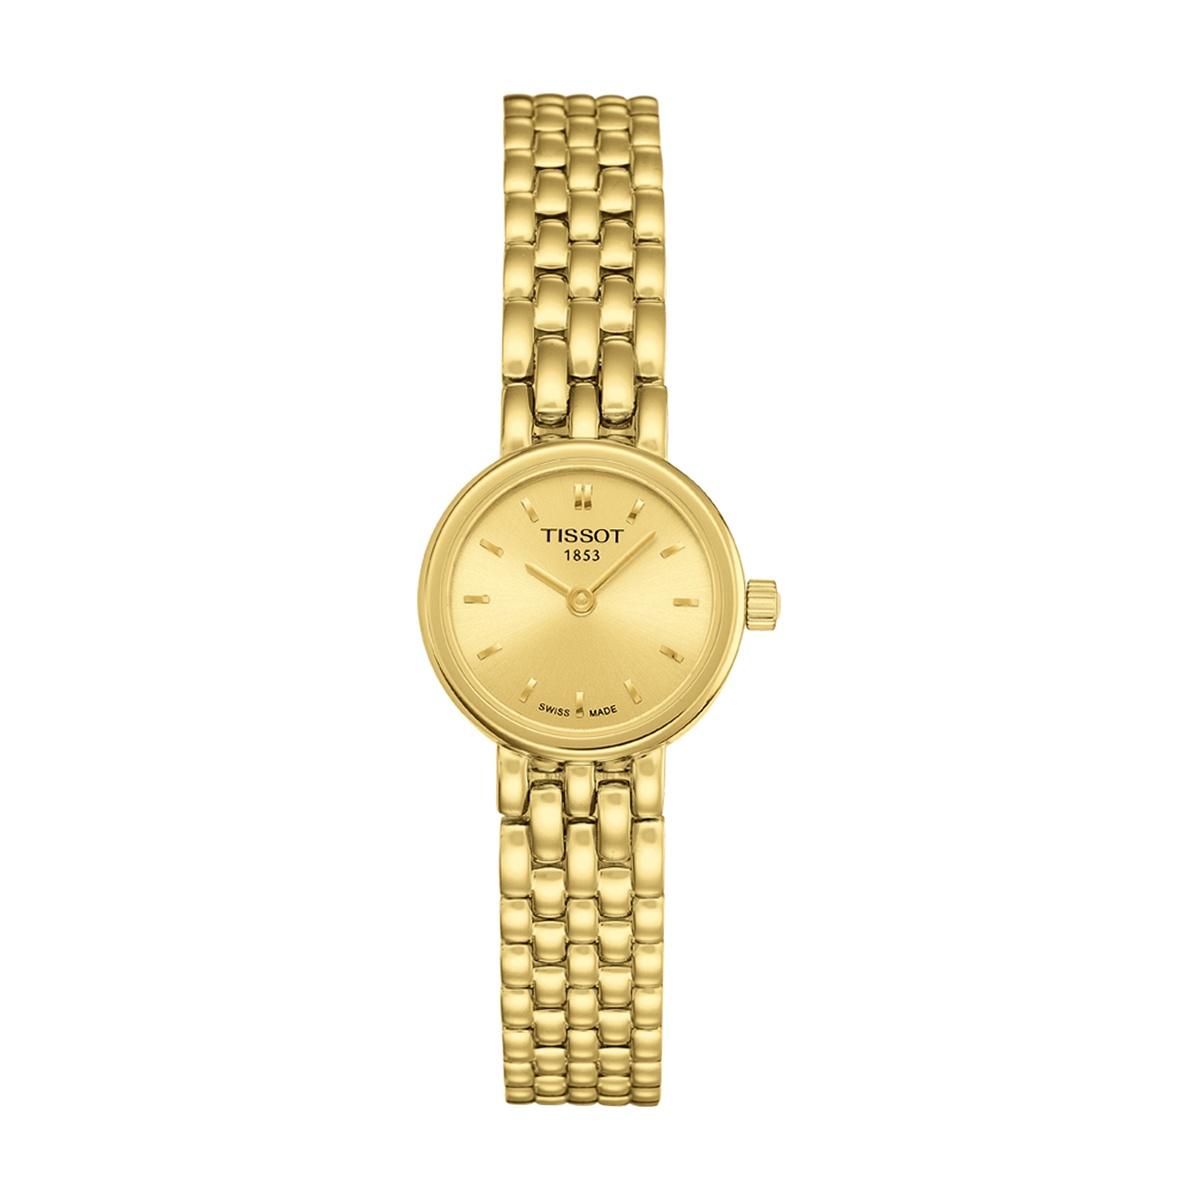 Часовник Tissot T058.009.33.021.00